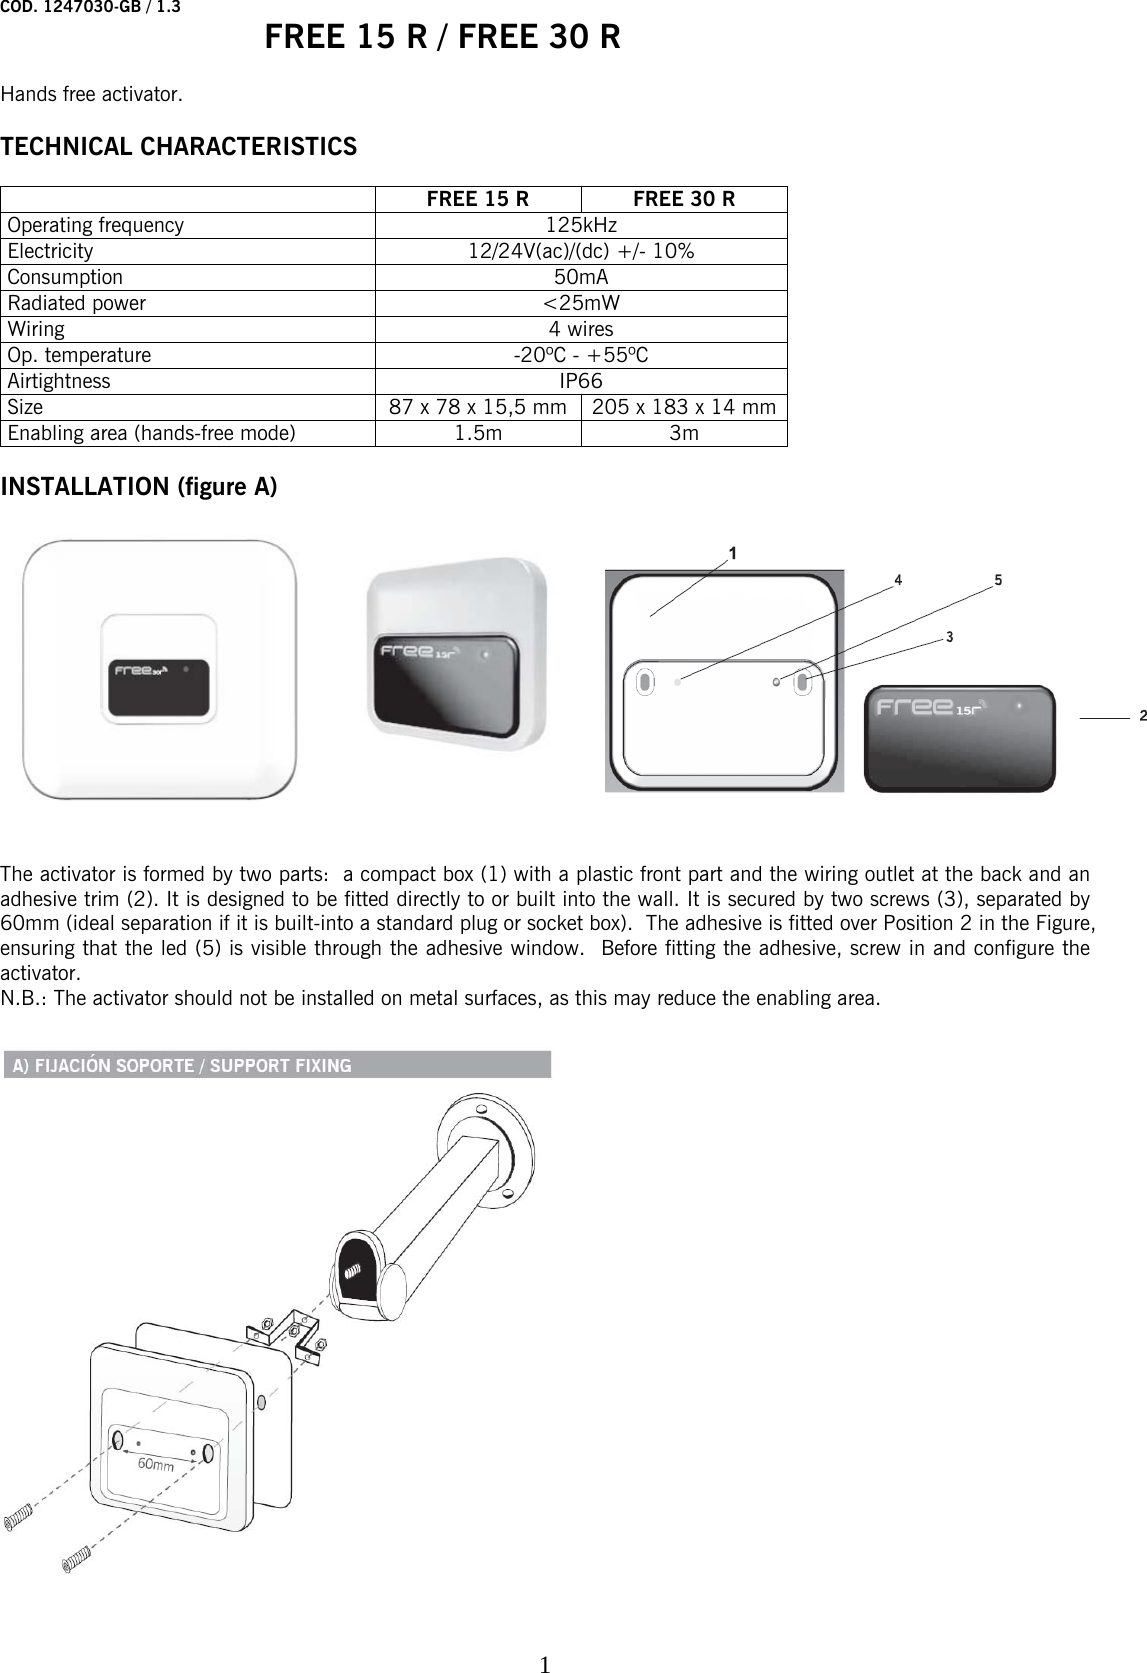 Jcm Technologies Free15r Rfid Reader User Manual 1247030 Free 15 30 Wiring 24v To Ac Dc R 1 3 Gb